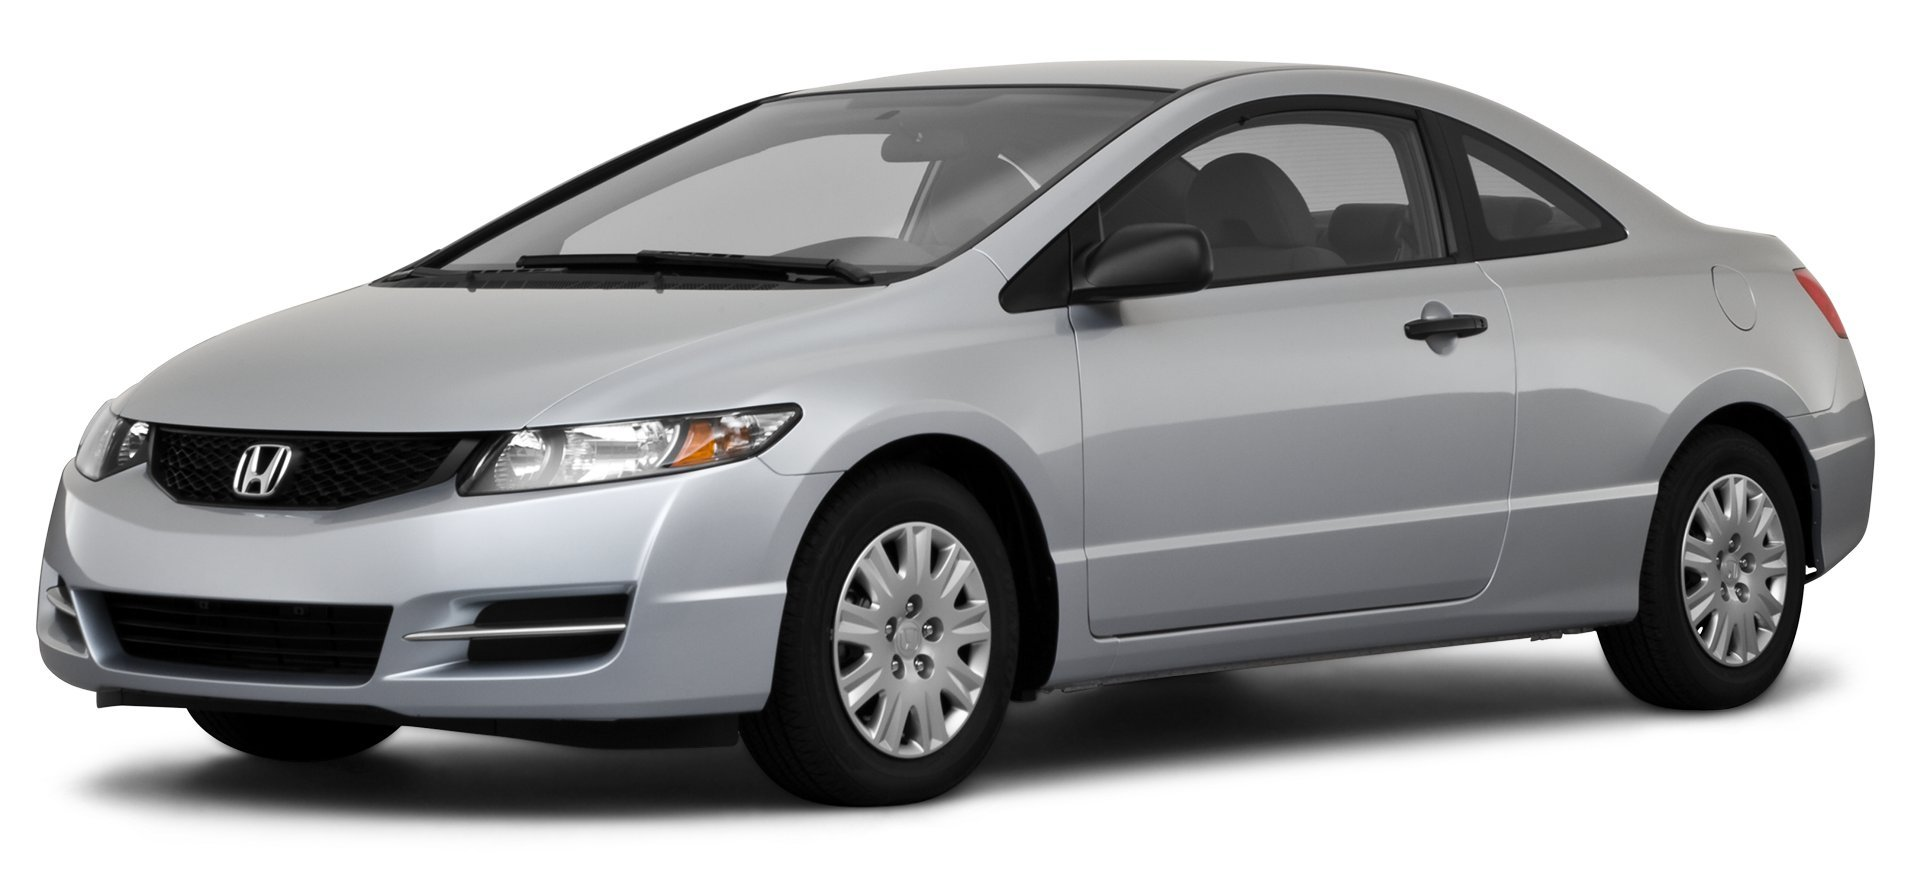 ... 2009 Honda Civic DX, 2-Door Manual Transmission ...